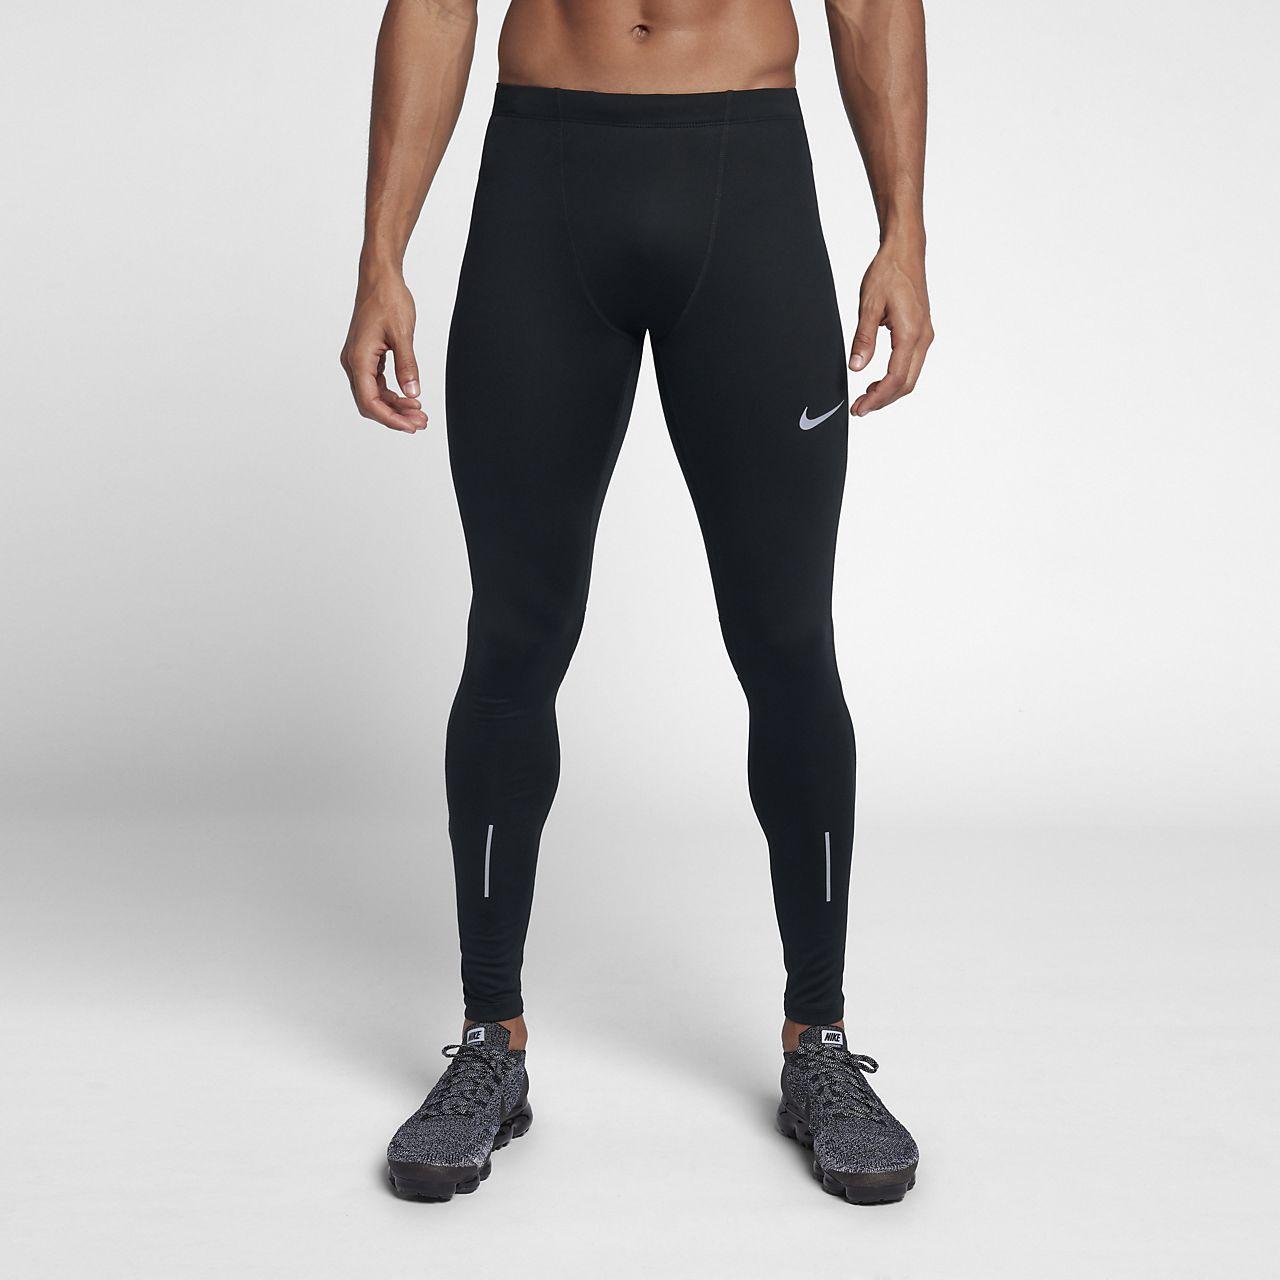 nike run men 39 s 28 5 running tights. Black Bedroom Furniture Sets. Home Design Ideas